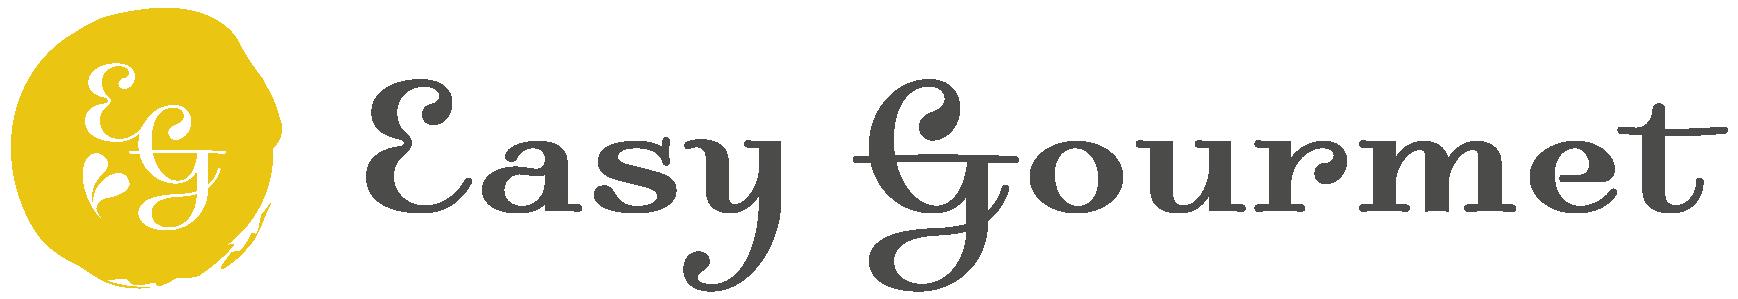 EasyGourmet-logo.png